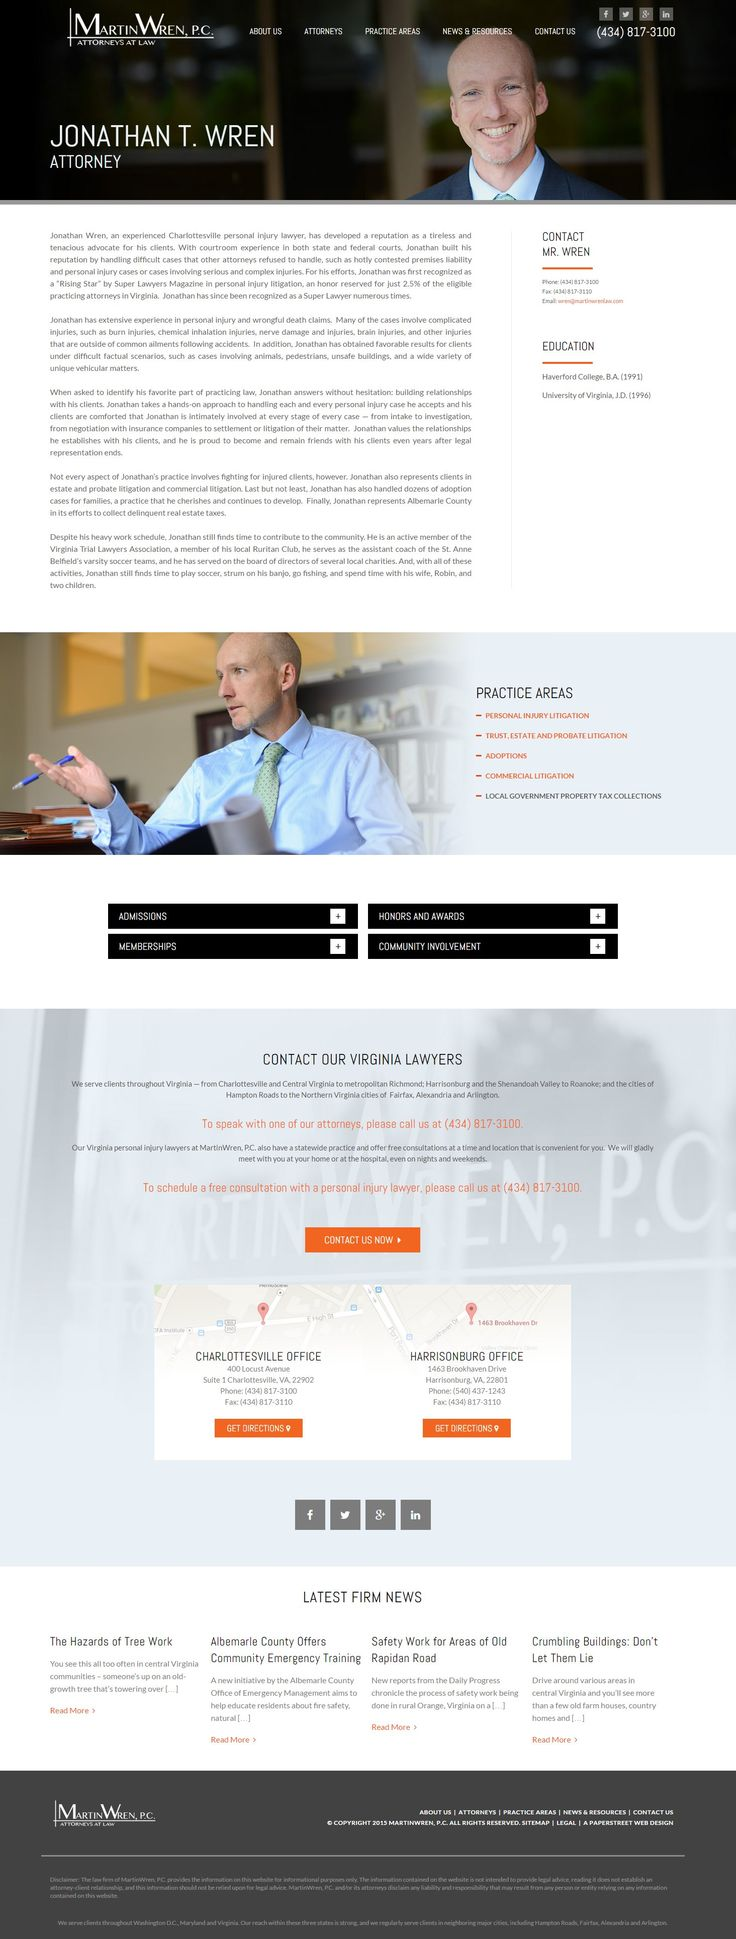 jonathan schwartz attorney 17 best images about attorney biography ...